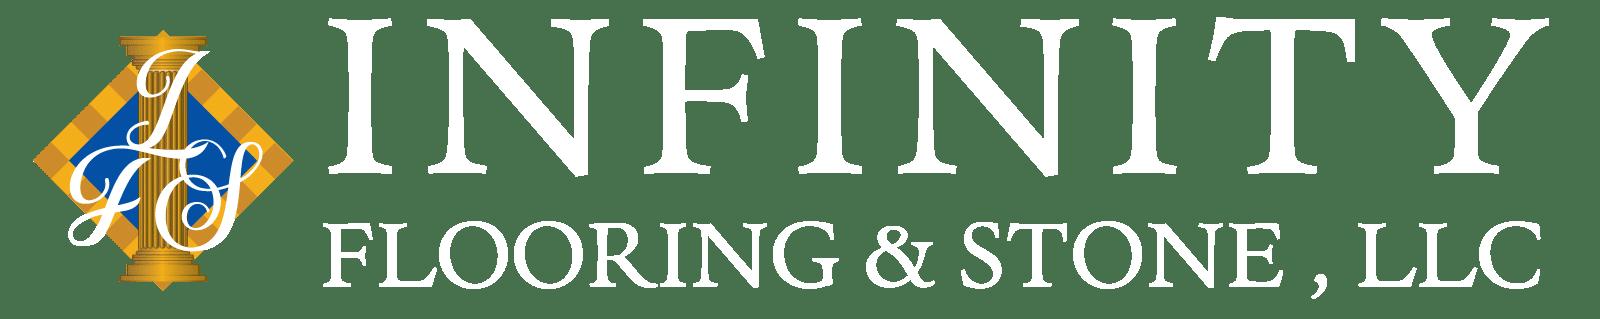 Infinity Flooring & Stone, LLC